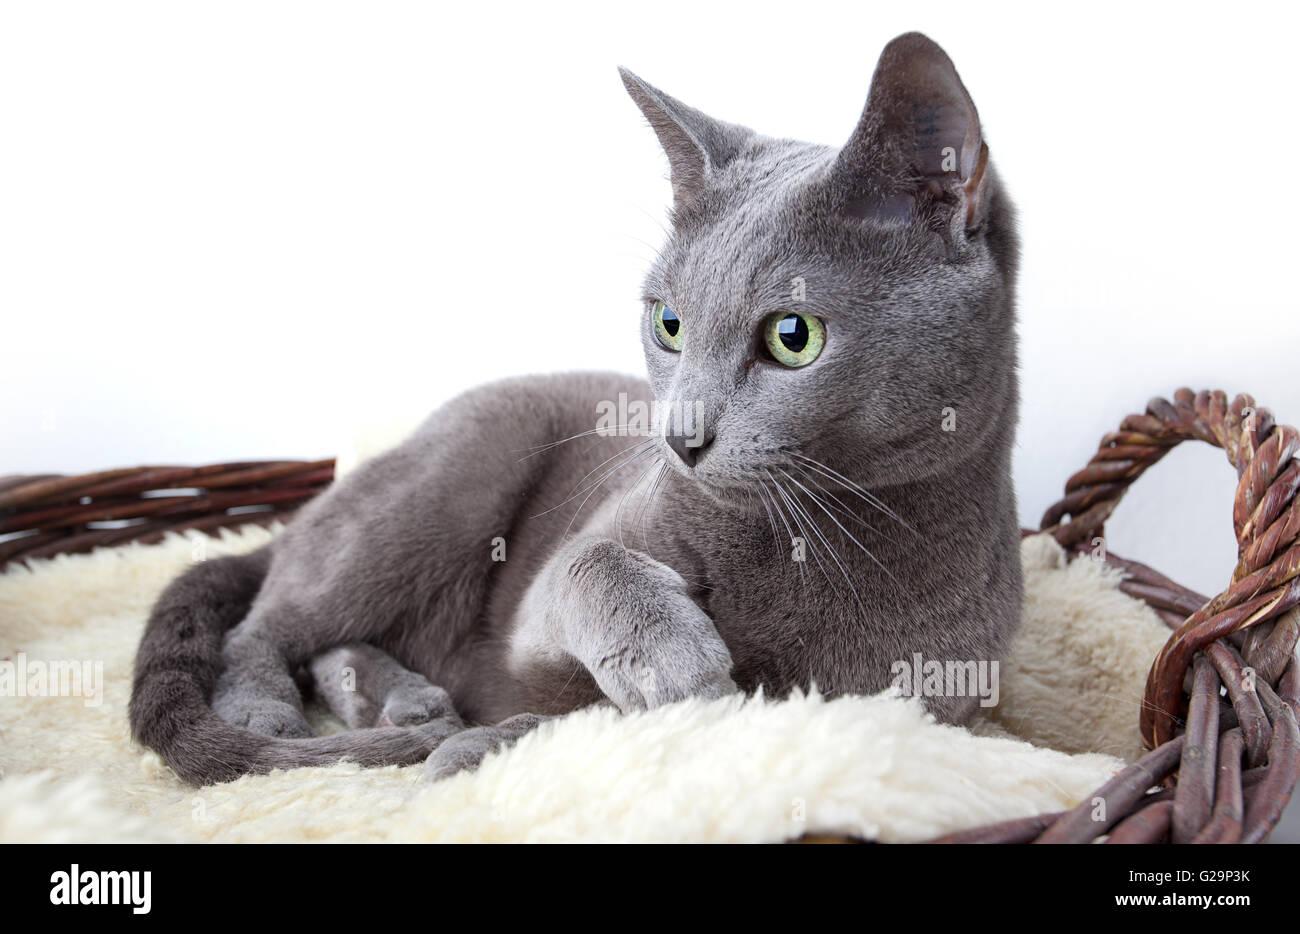 Elegante Russisch Blau Rassekatze auf Lammfell Immagini Stock